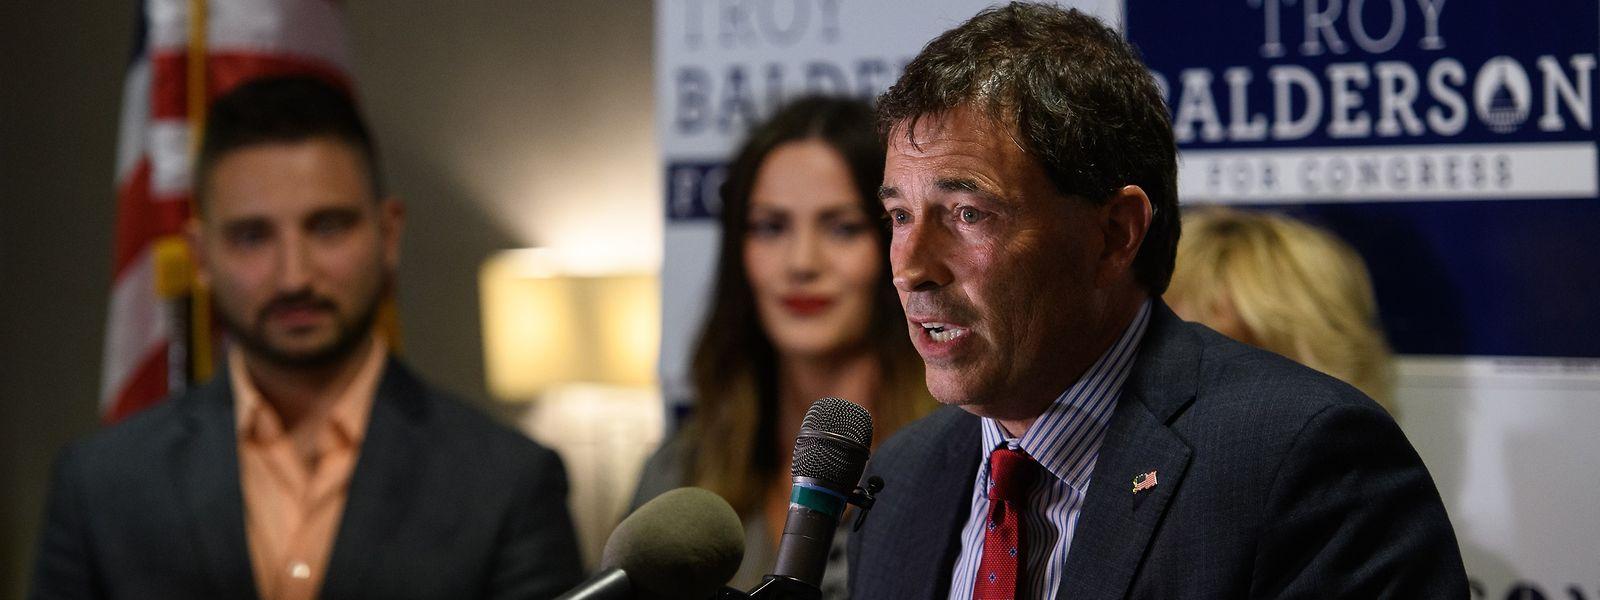 Euphorie sieht anders aus: Troy Balderson am Wahlabend.